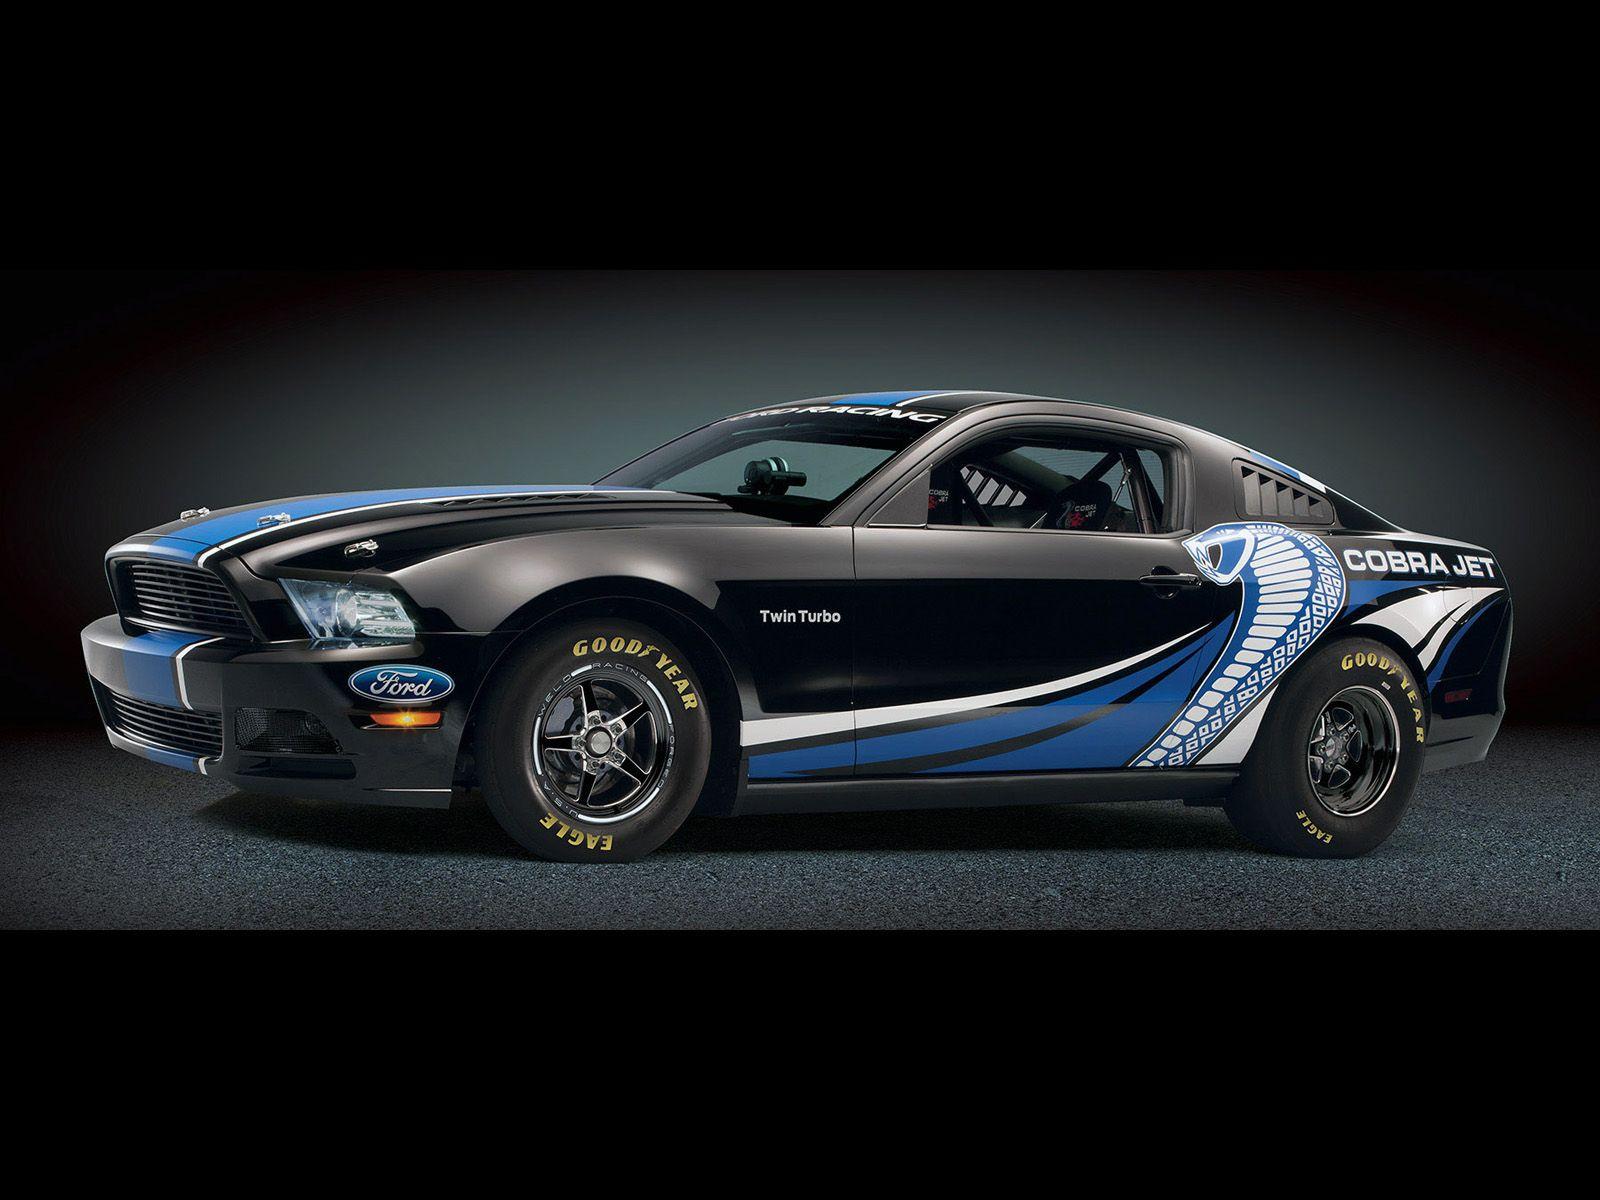 2012 Ford Mustang Cobra Jet Twin Turbo Concept Studio 1